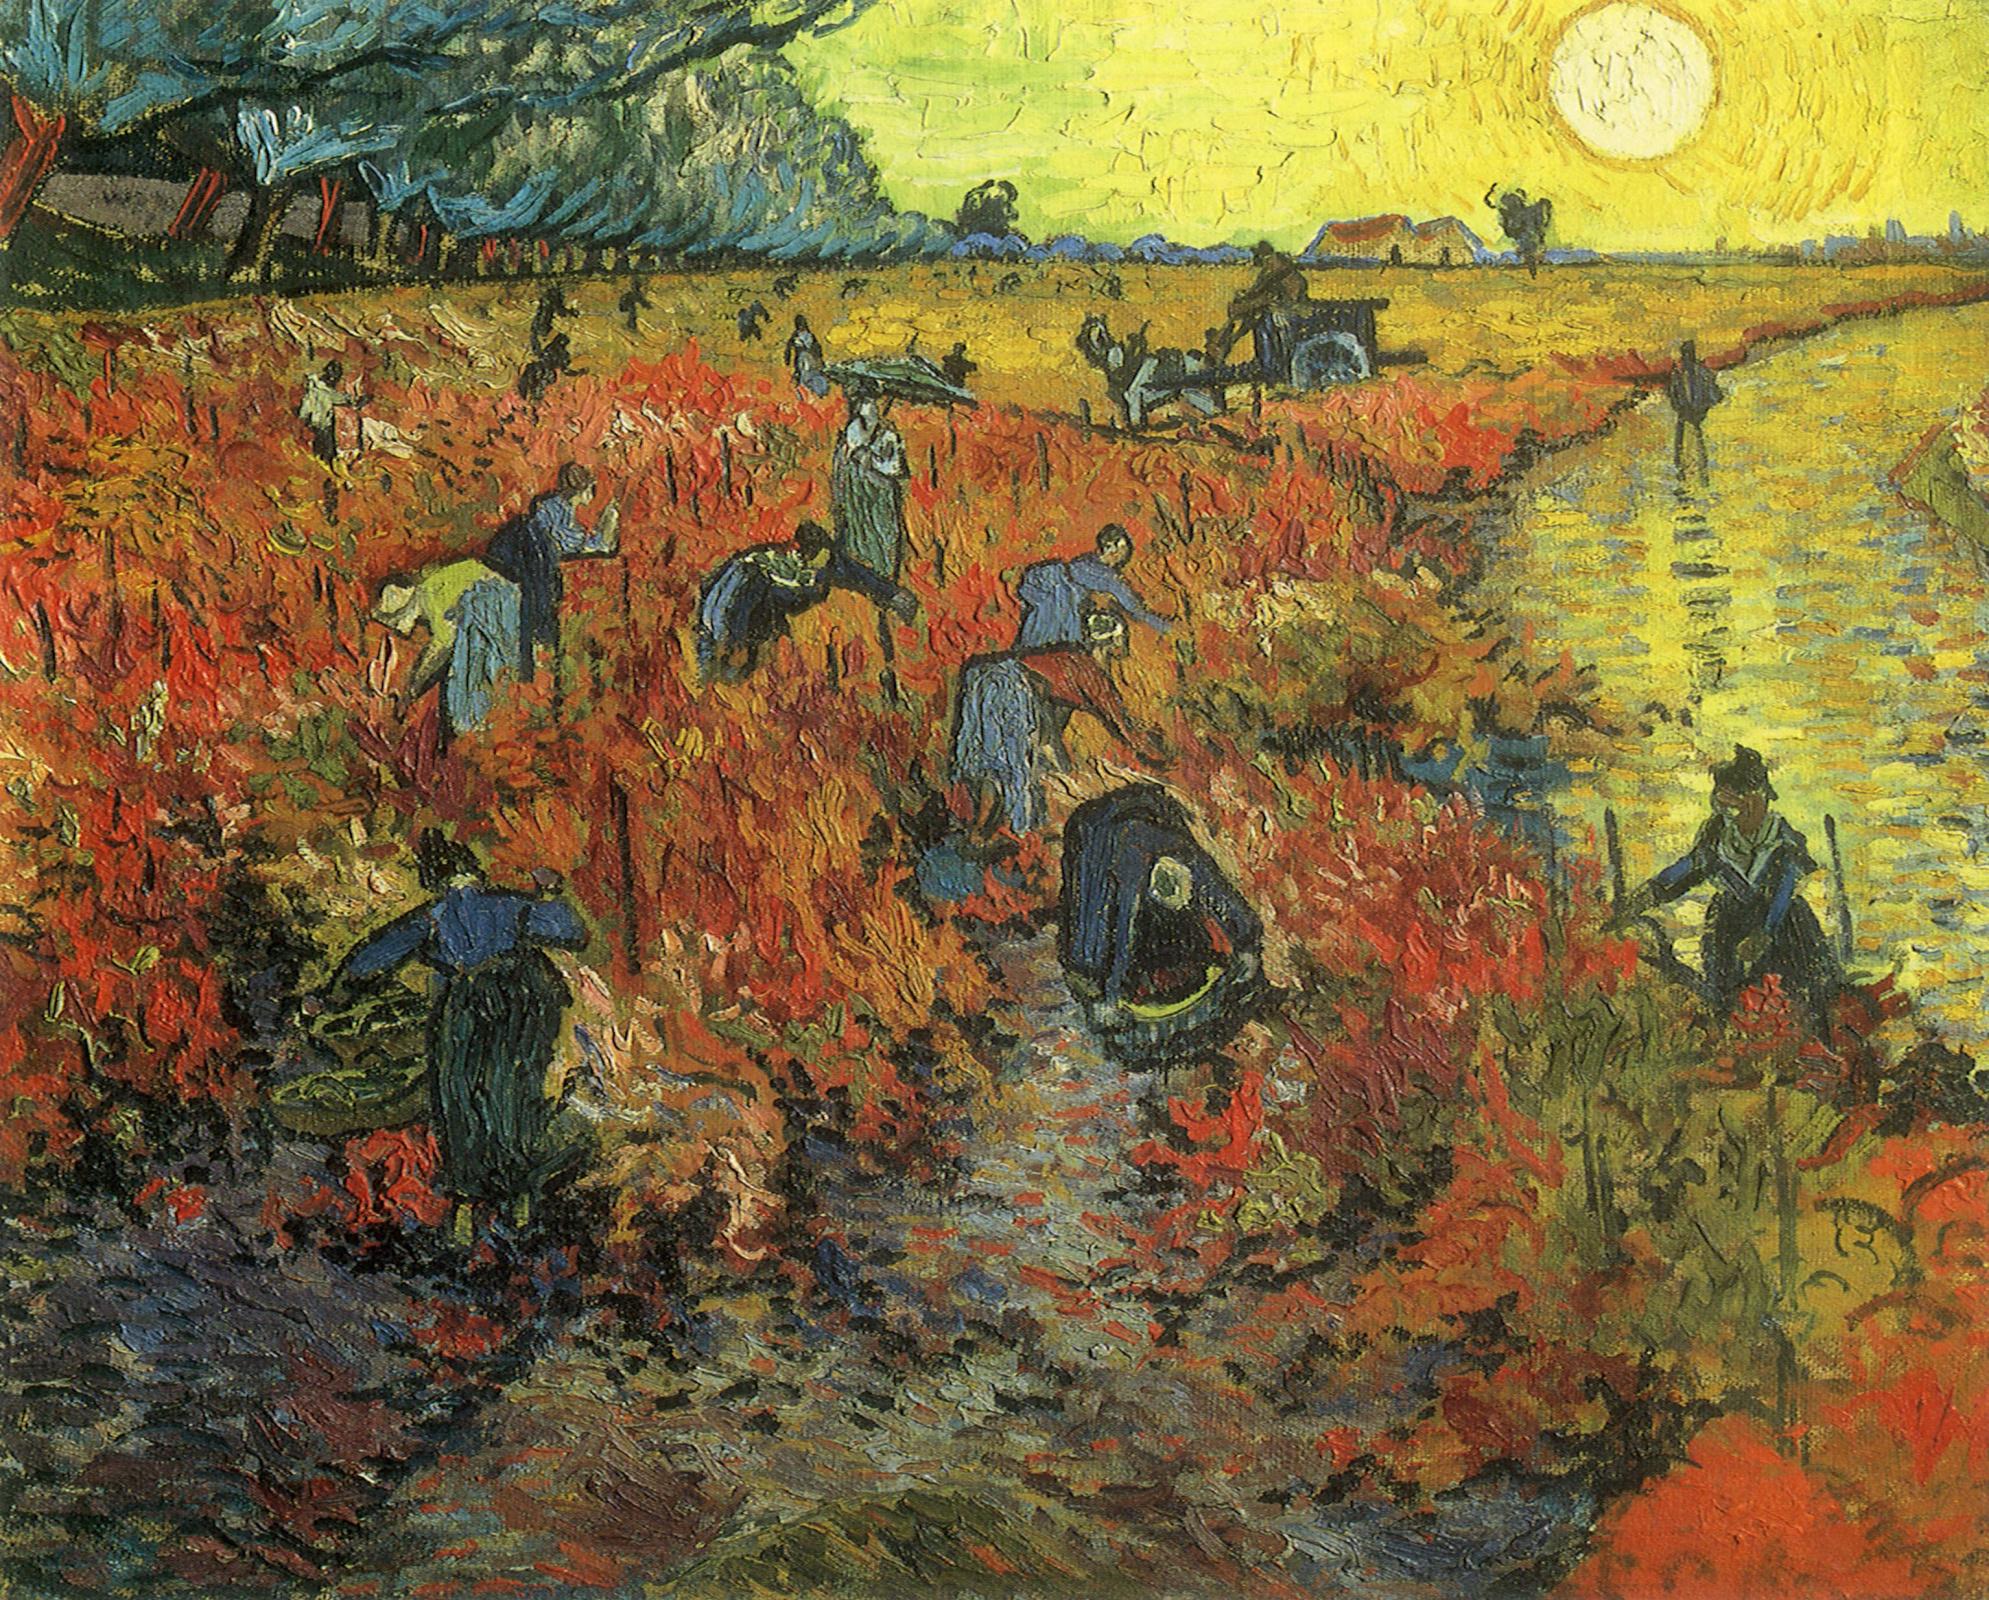 Vincent van Gogh. Red Vineyards at Arles